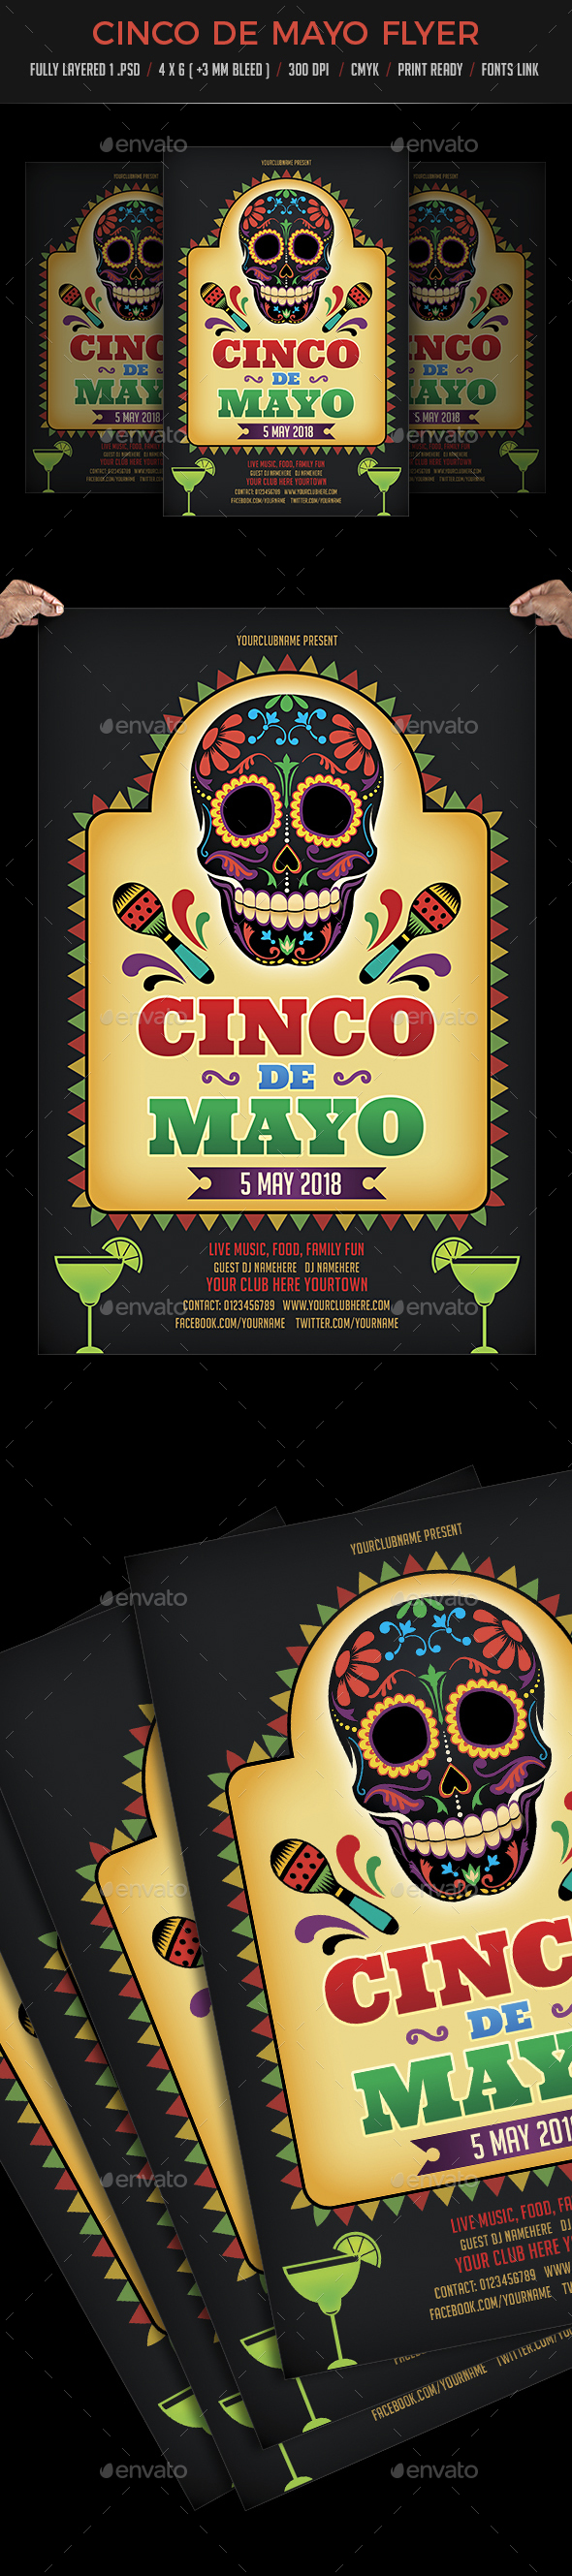 Cinco De Mayo Flyer Template - Events Flyers